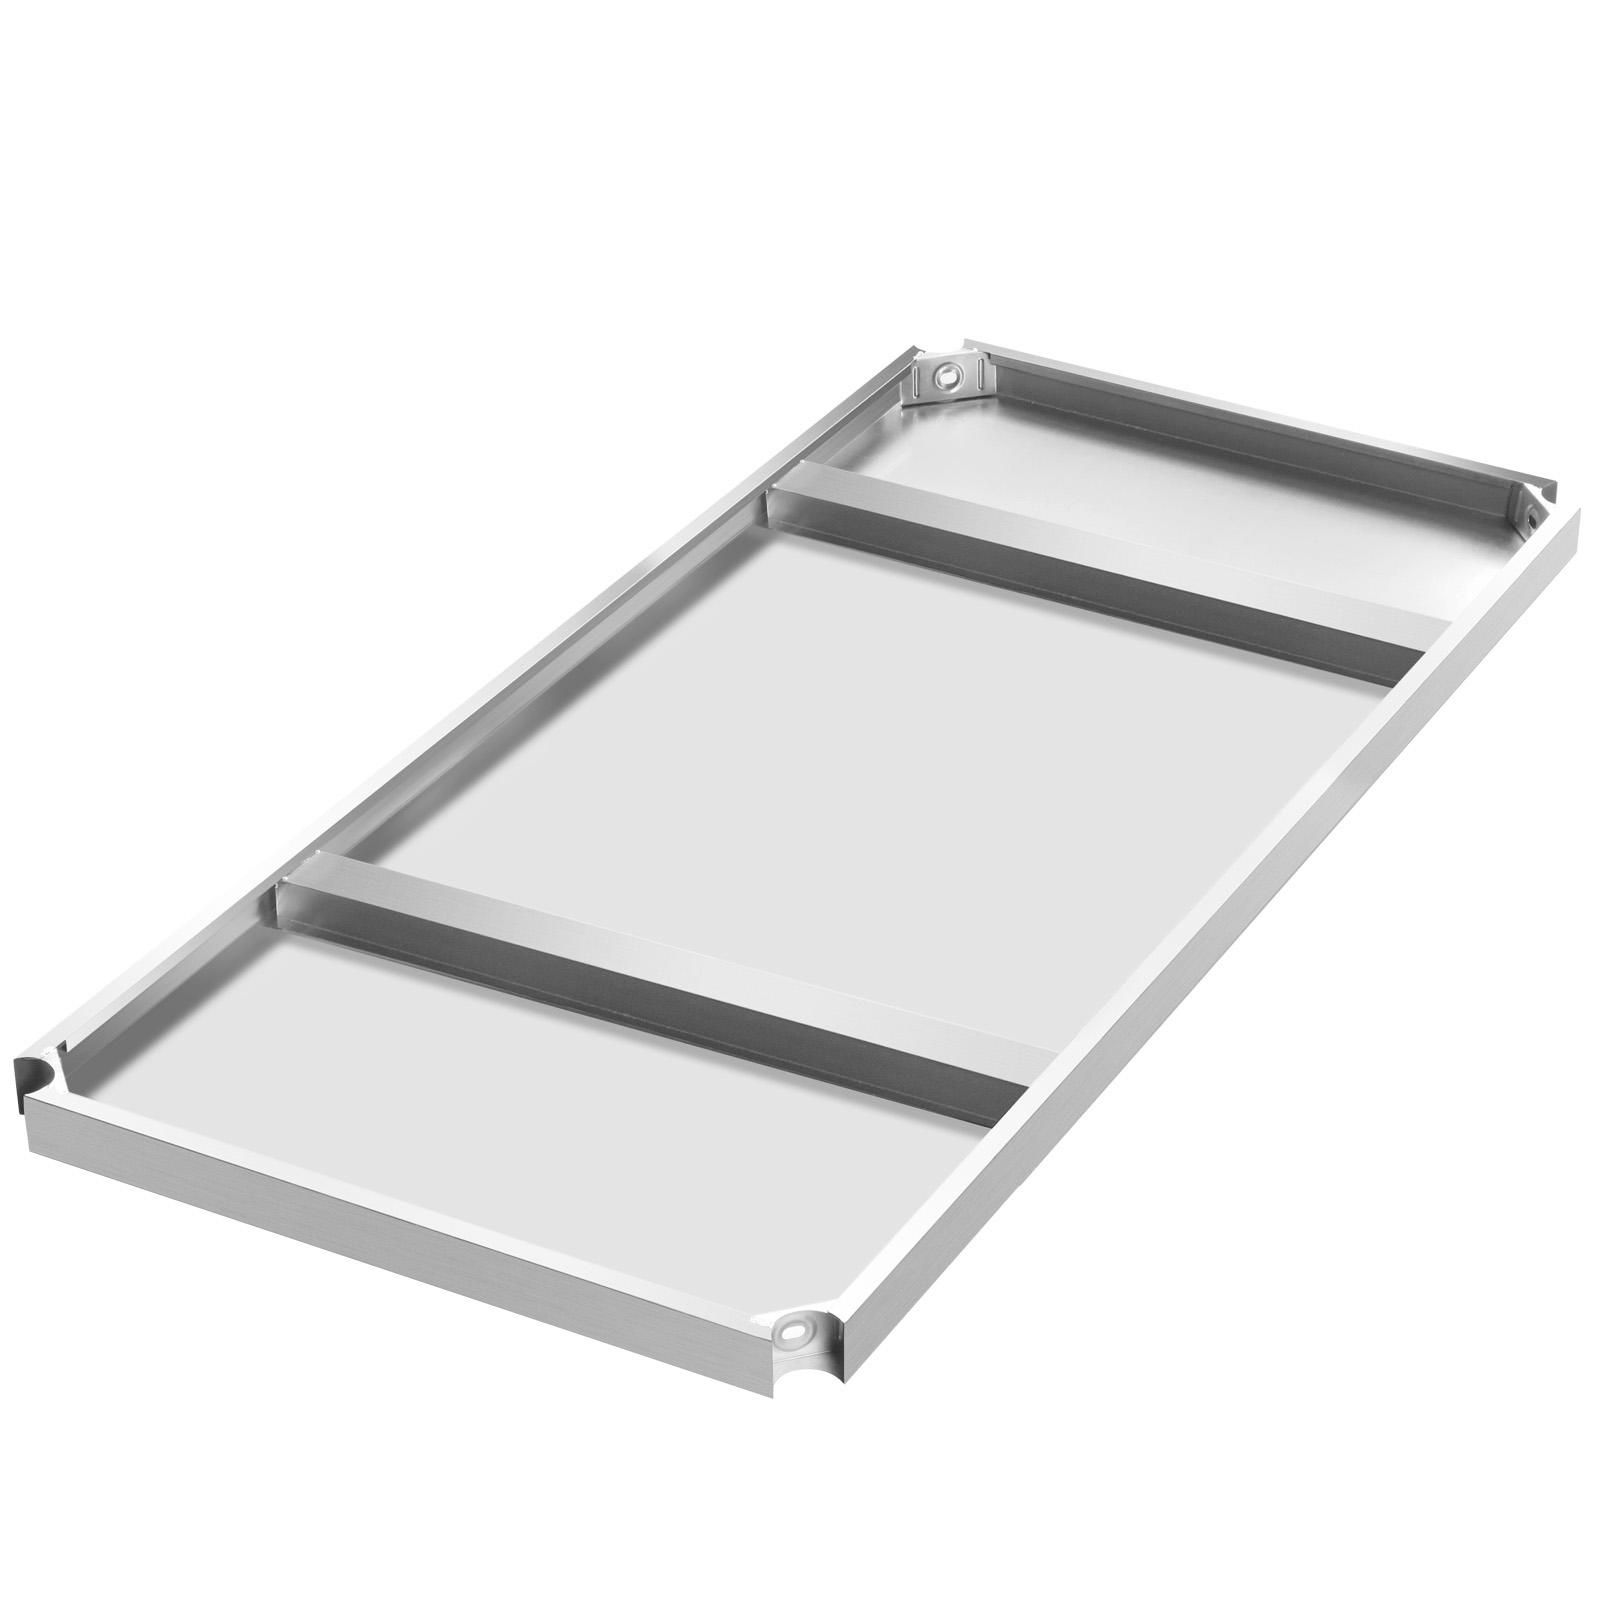 stainless steel work prep table w backsplash kitchen restaurant new